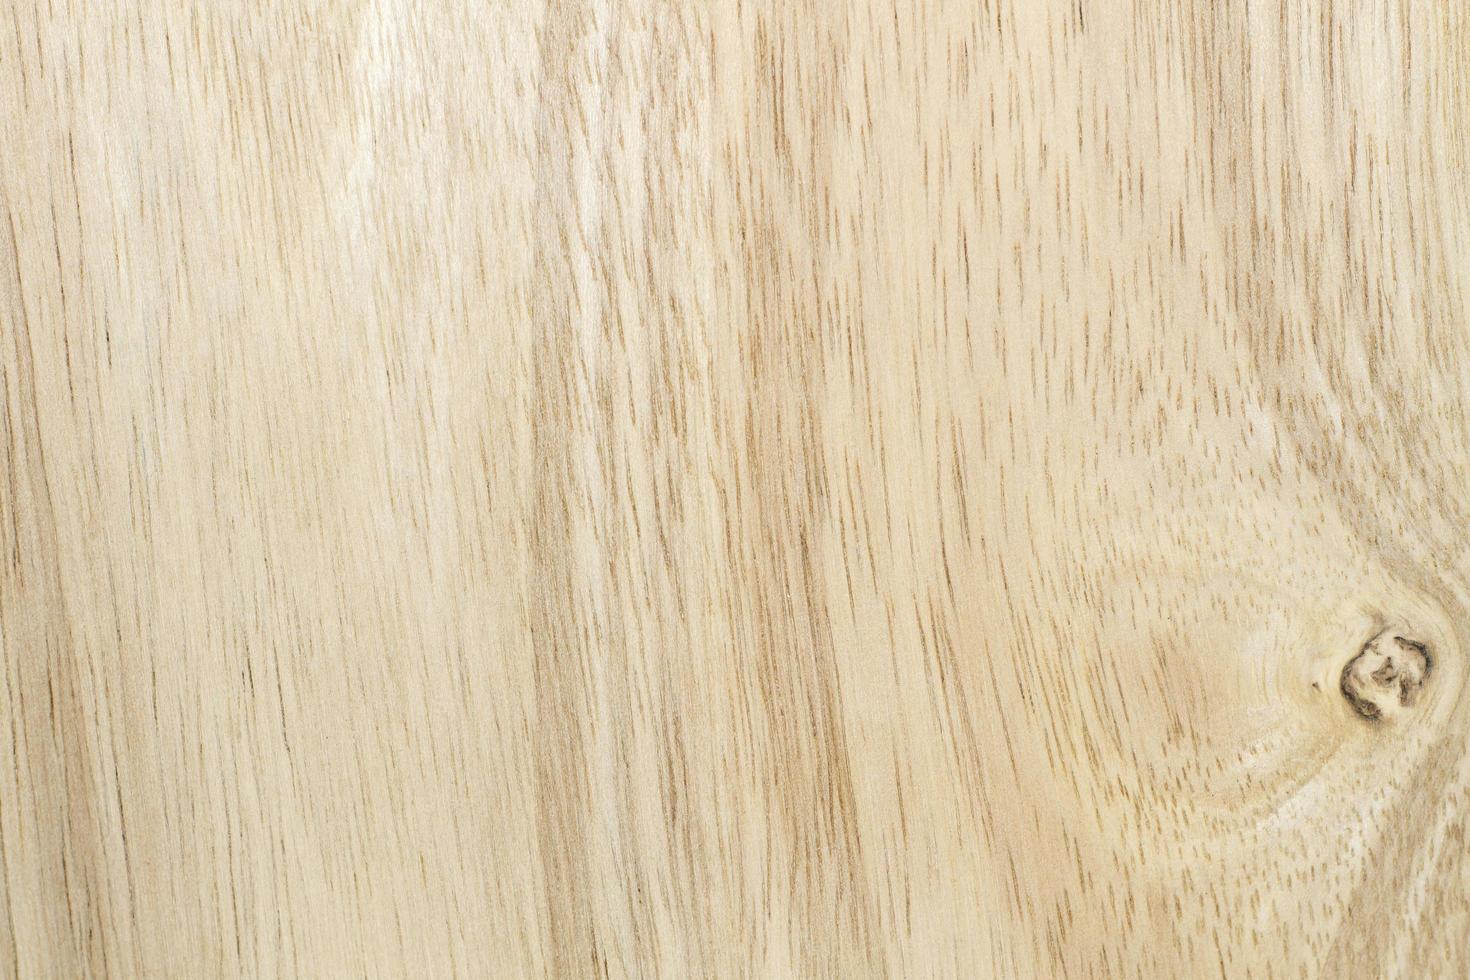 houten textuurachtergrond foto